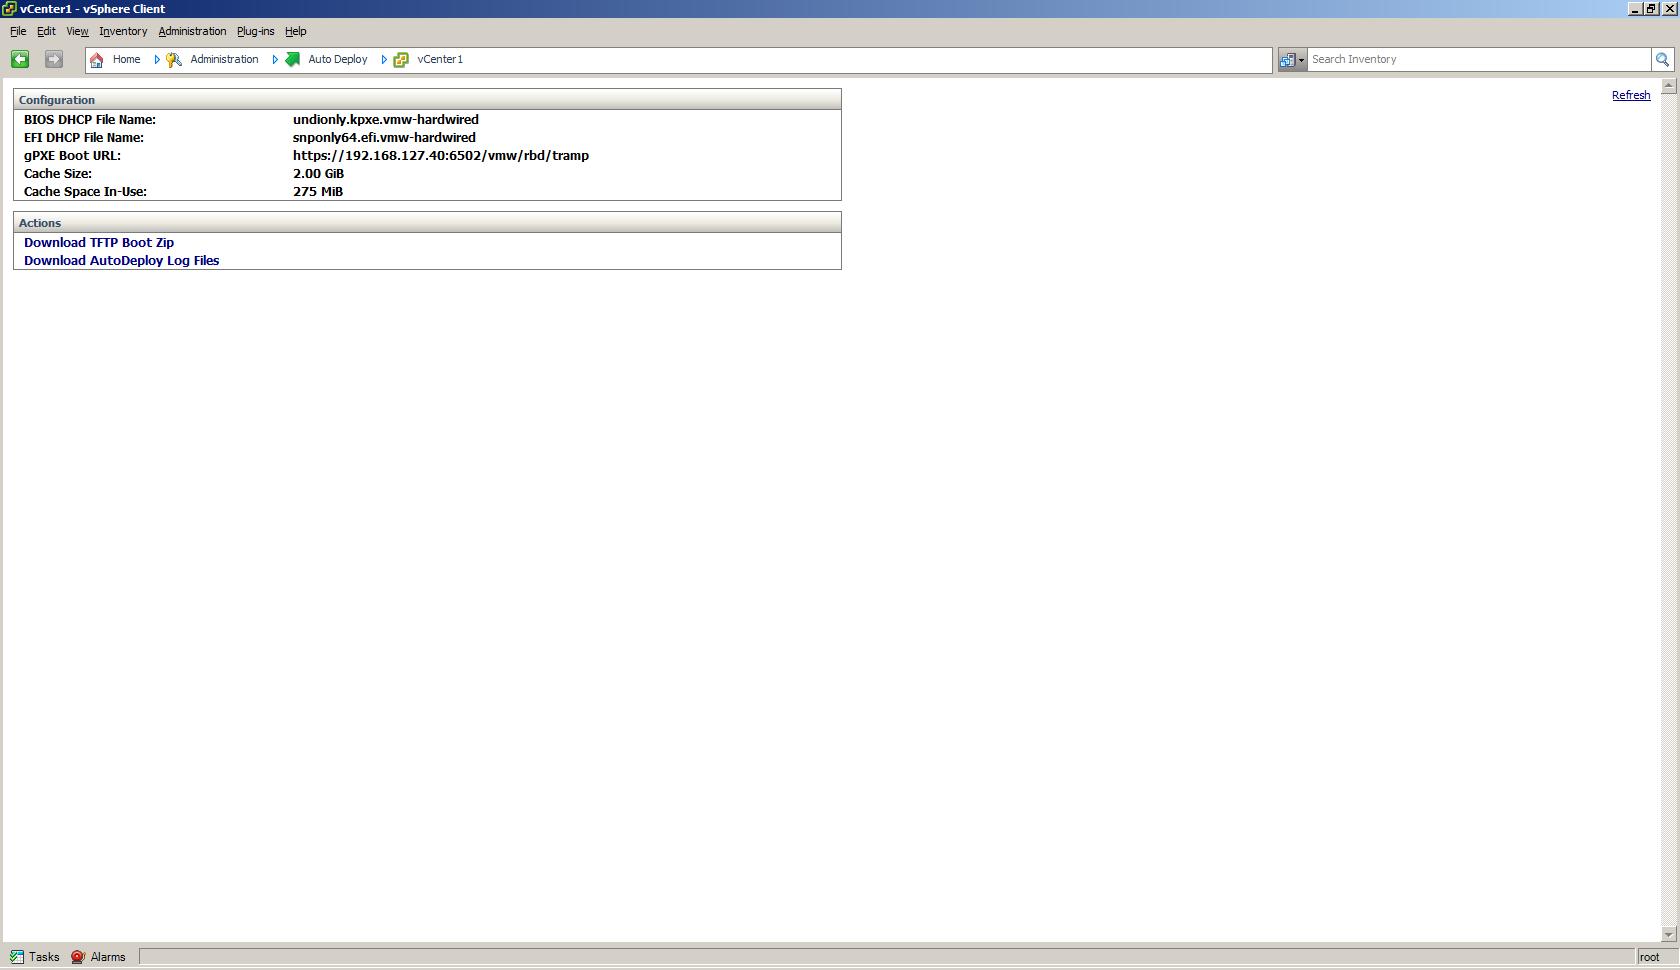 Configuring VMware AutoDeploy Feature – doOdzZZ'sNotes